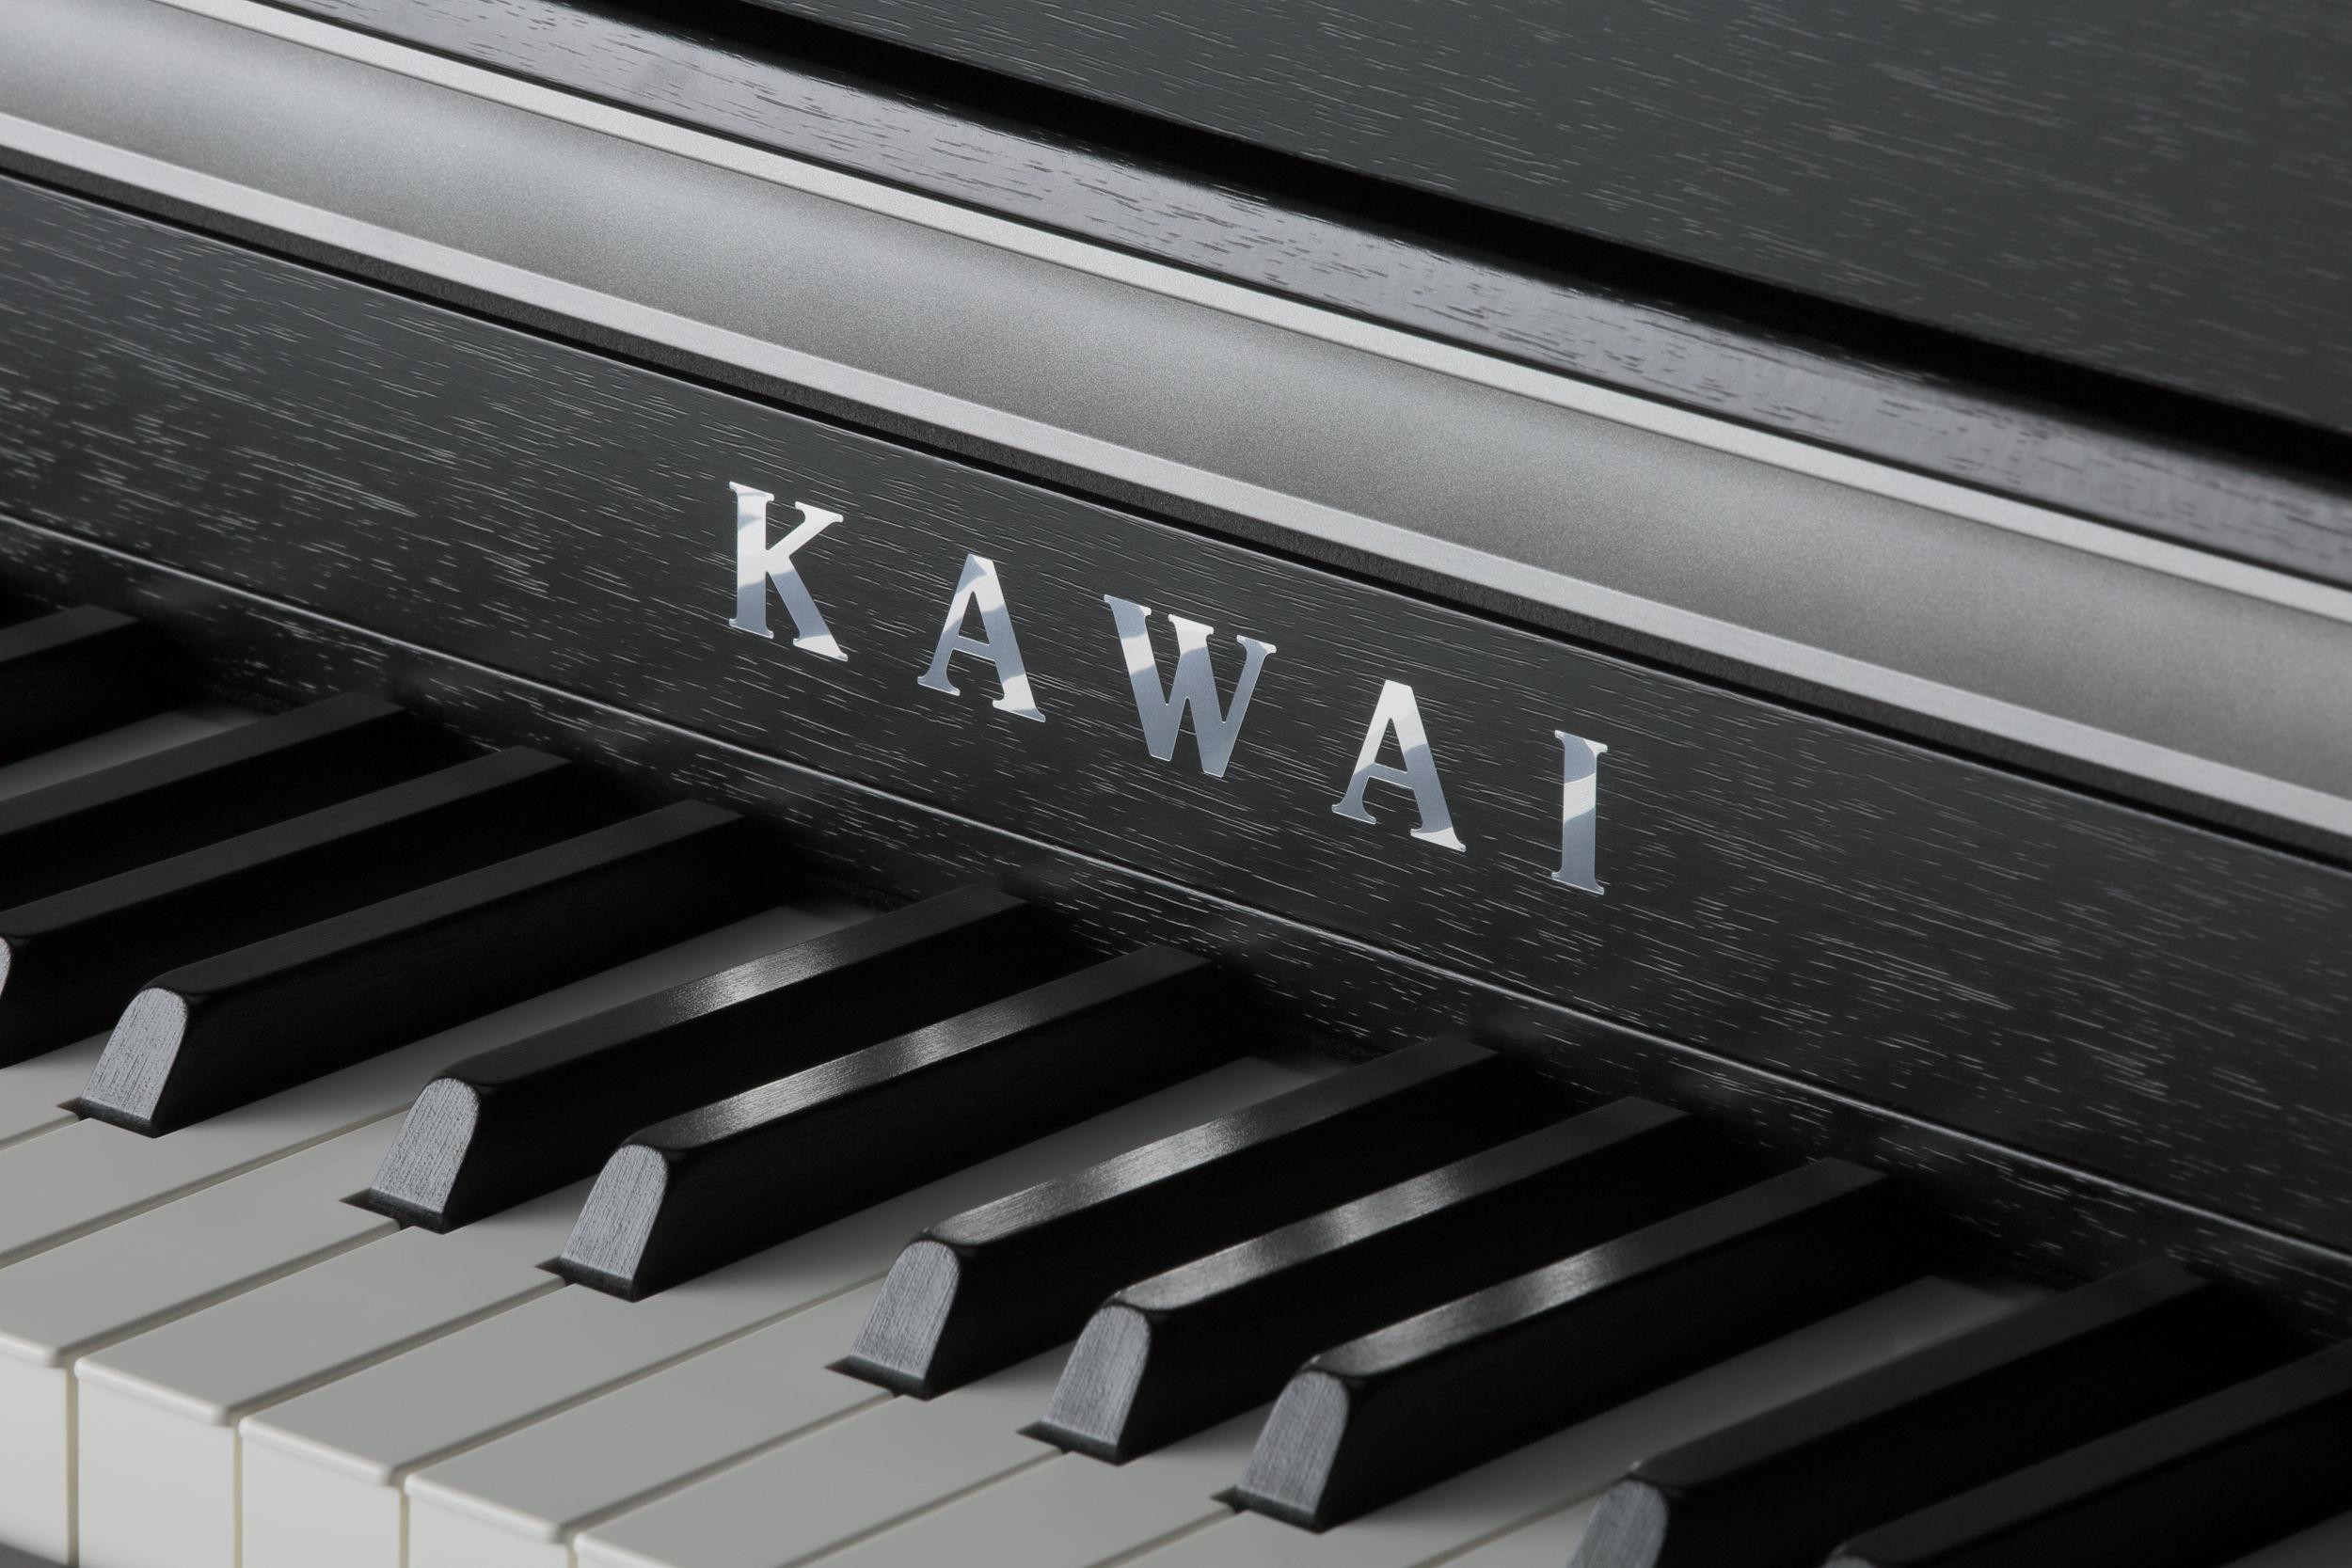 Ca 97- Kawai, Aspheim